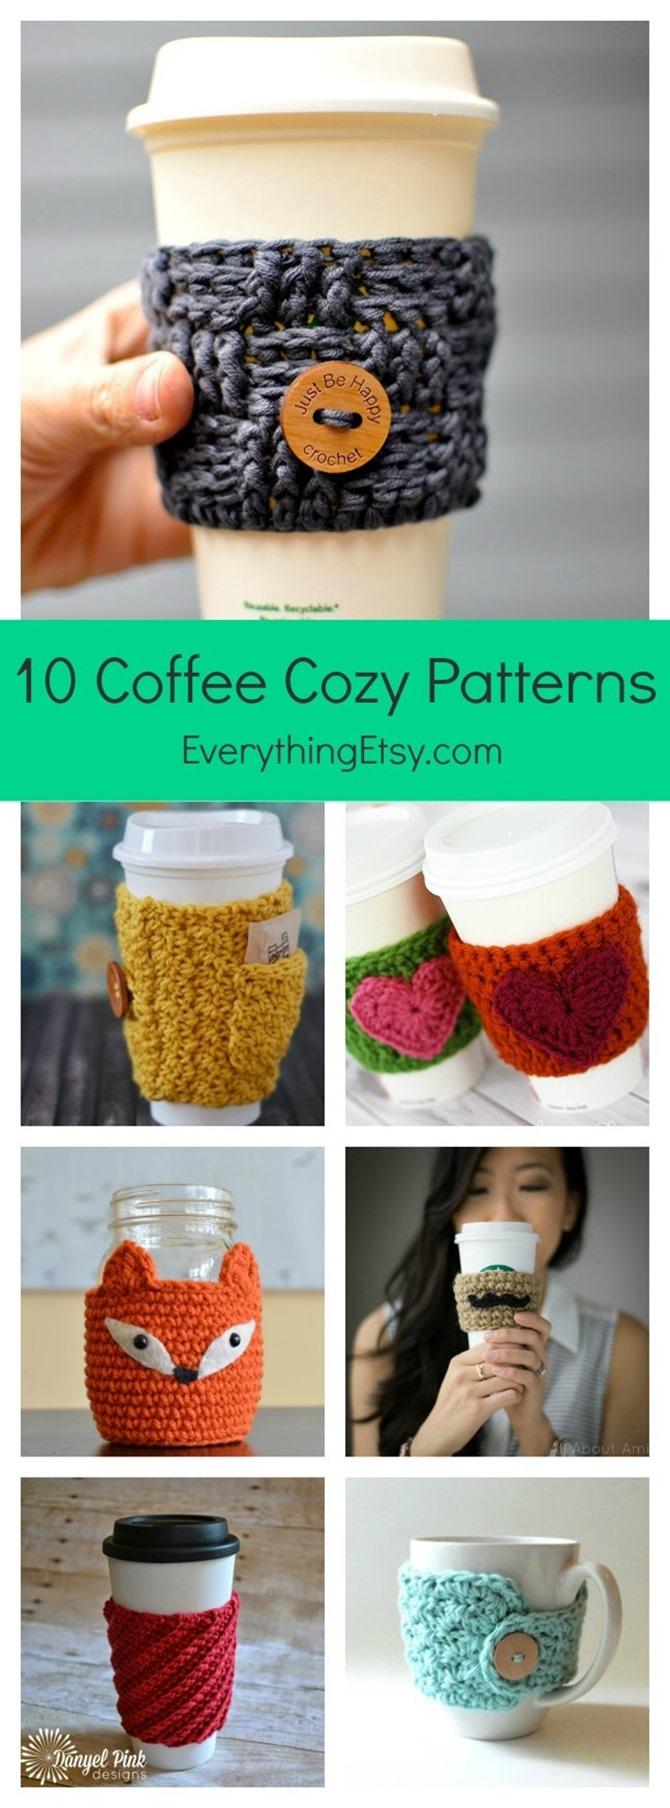 10-Free-Coffee-Cozy-Crochet-Patterns-on-EverythingEtsy.com_ (1)